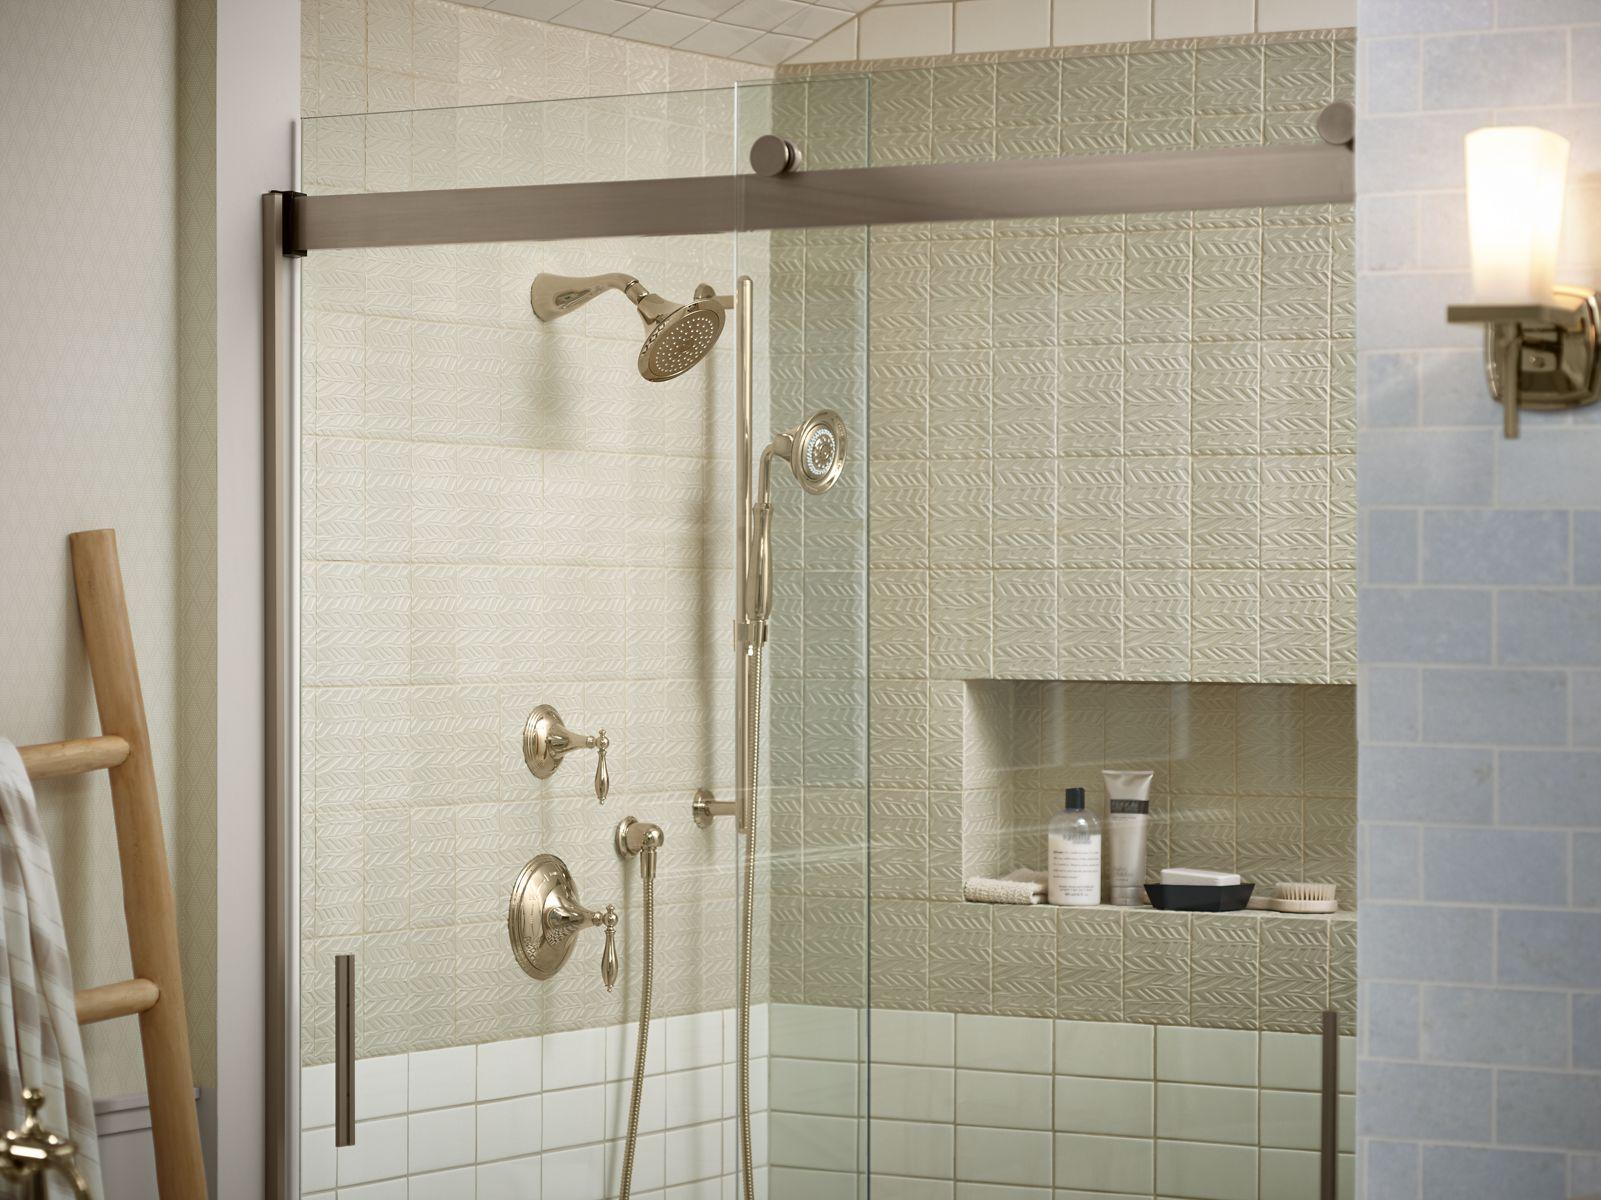 Uncategorized Types Of Shower Door Glass Purecolonsdetoxreviews Home Design